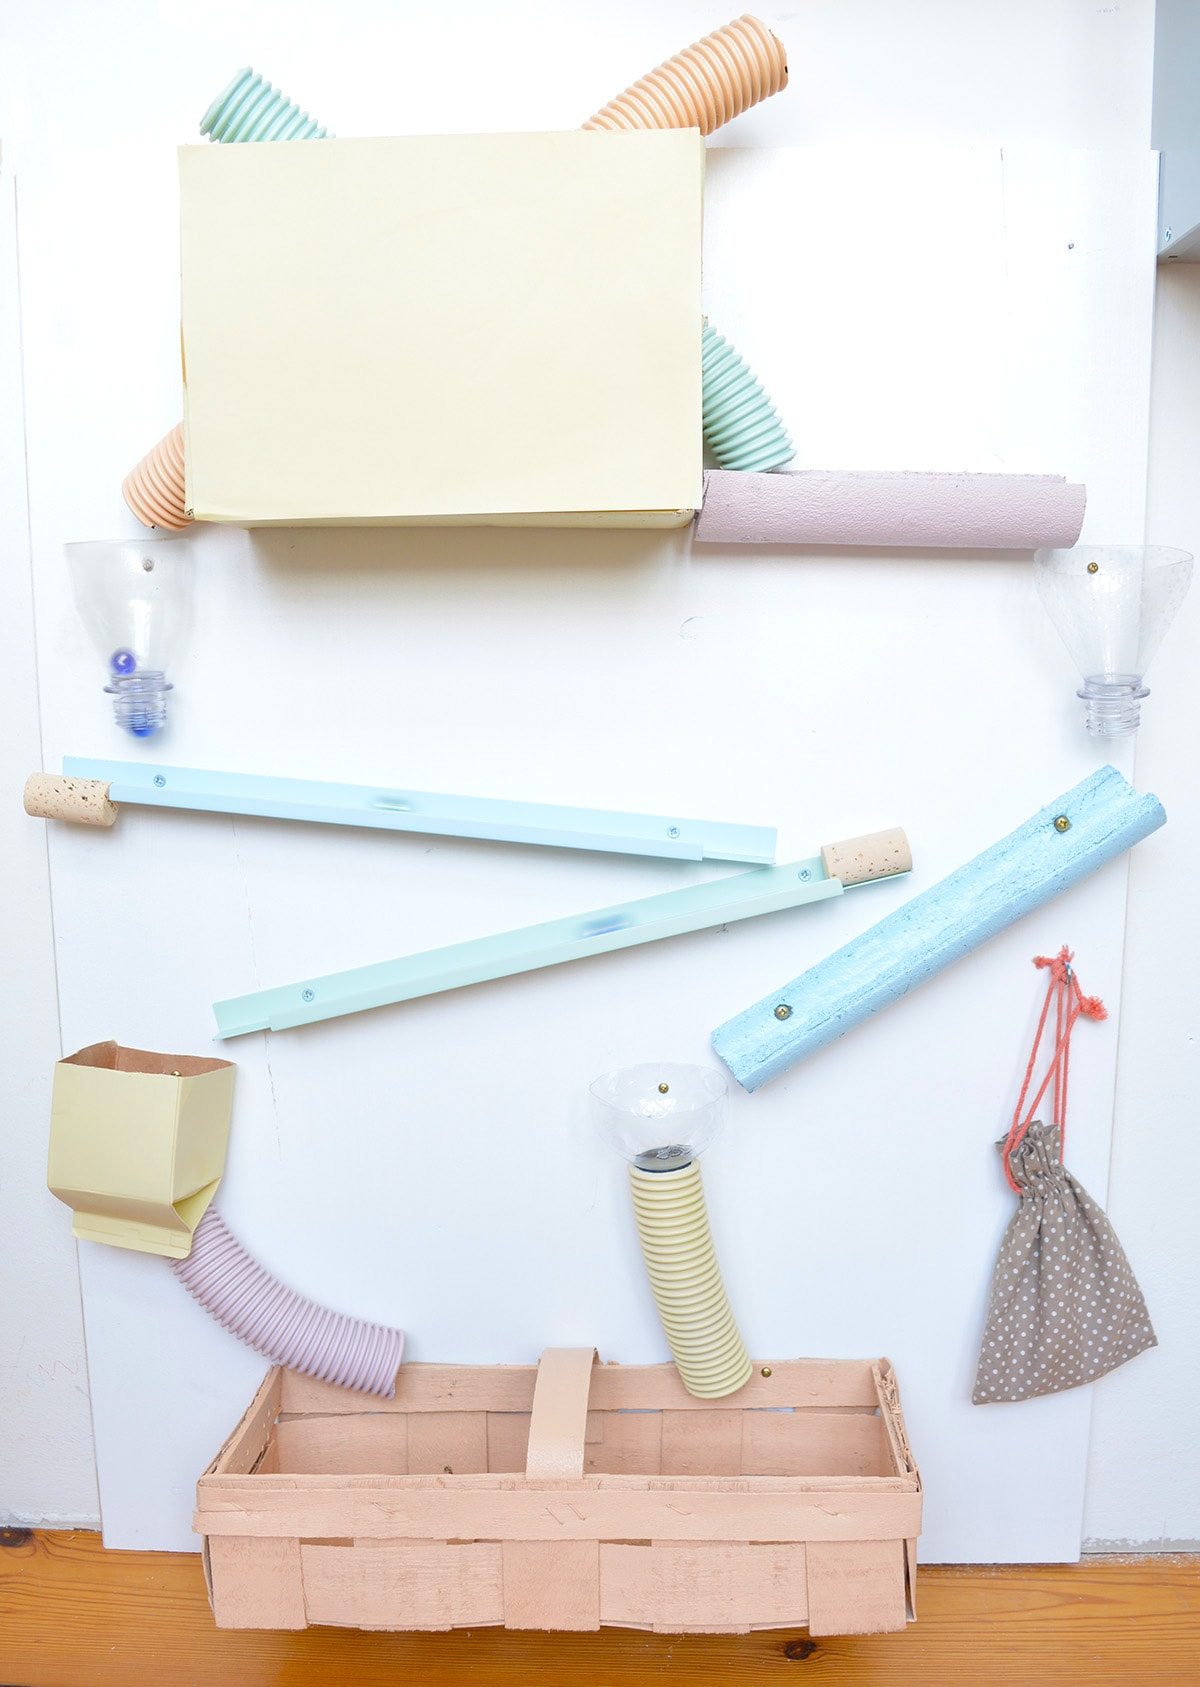 wc aufkleber selber gestalten wc sitz klodeckel selber gestalten auf amazon wc toilettendeckel. Black Bedroom Furniture Sets. Home Design Ideas